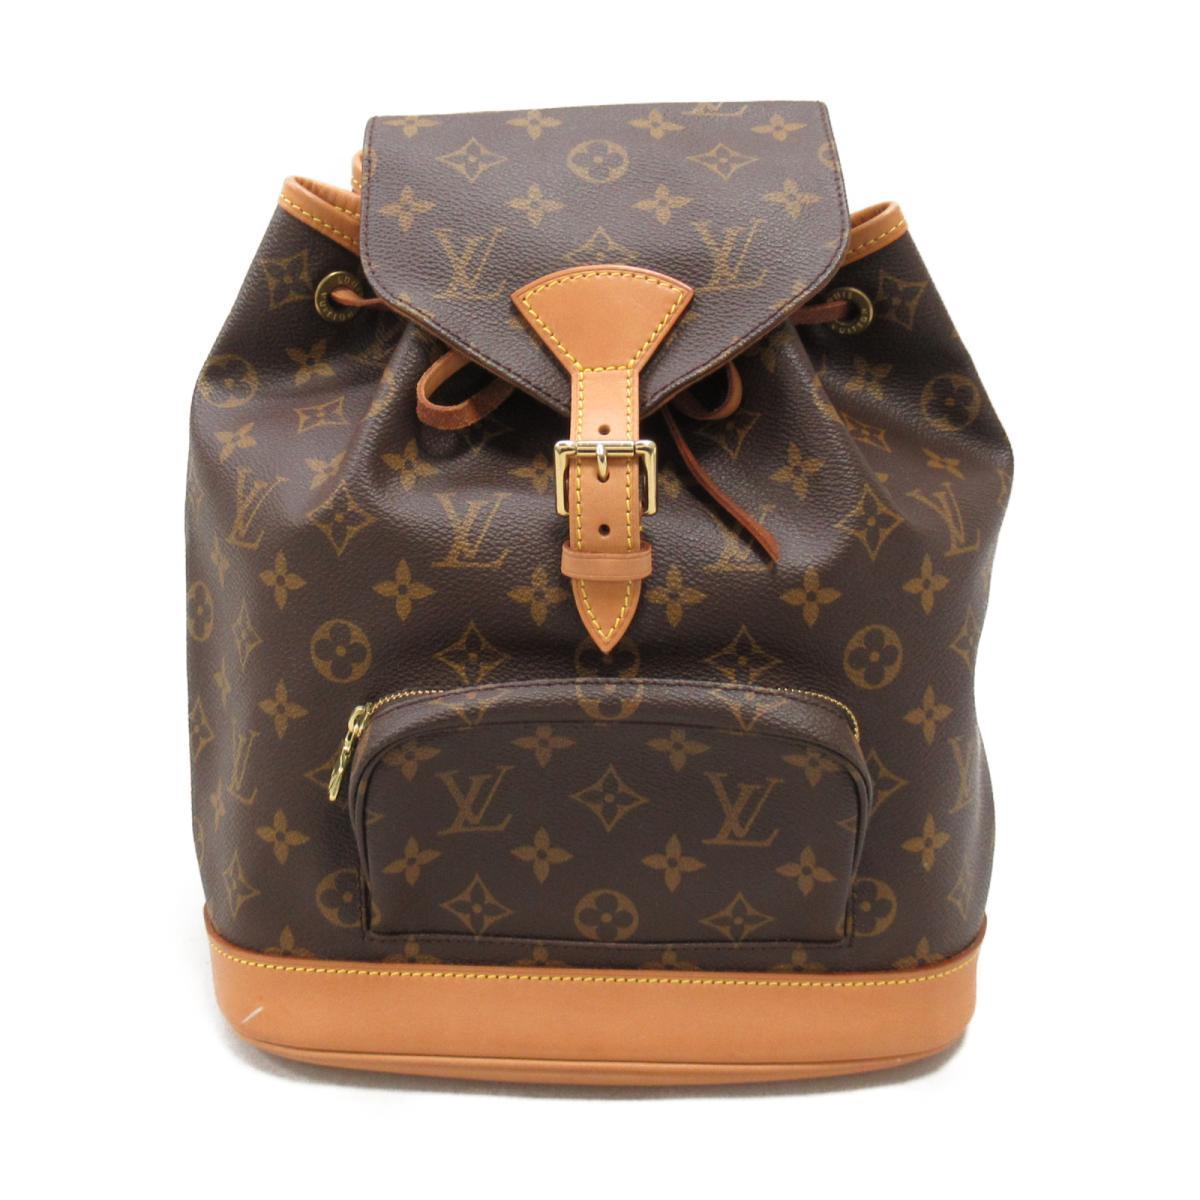 Used Louis Vuitton Bags >> Auth Louis Vuitton Montsouris Mm Backpack Rucksack Bag M51136 Monogram Canvas Used Lv Brandoff Ginza Tokyo Japan